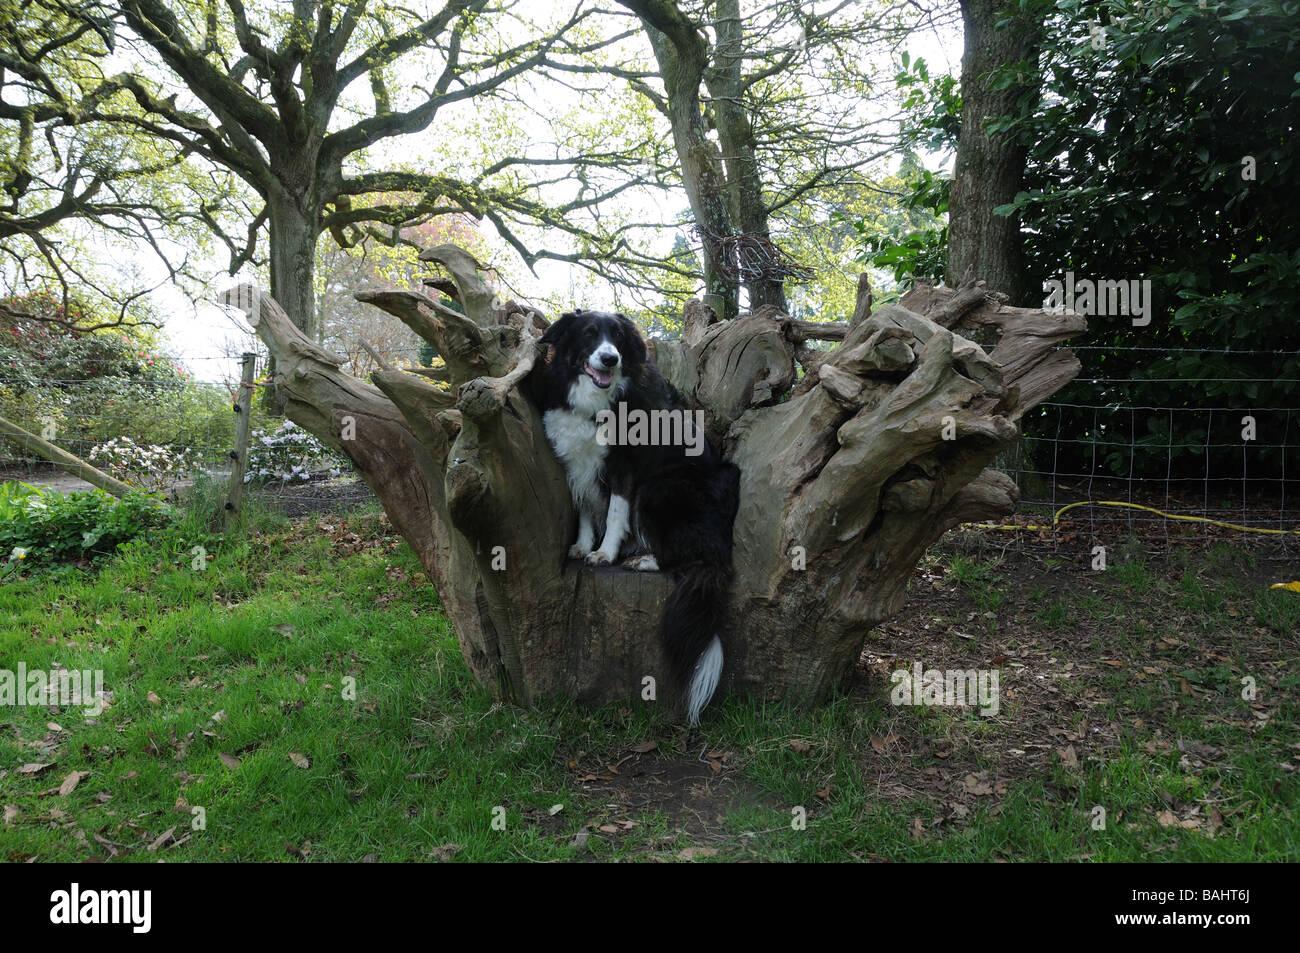 Tree Stump Seats Dog On Tree Stump Seat Stock Photo Royalty Free Image 23749114